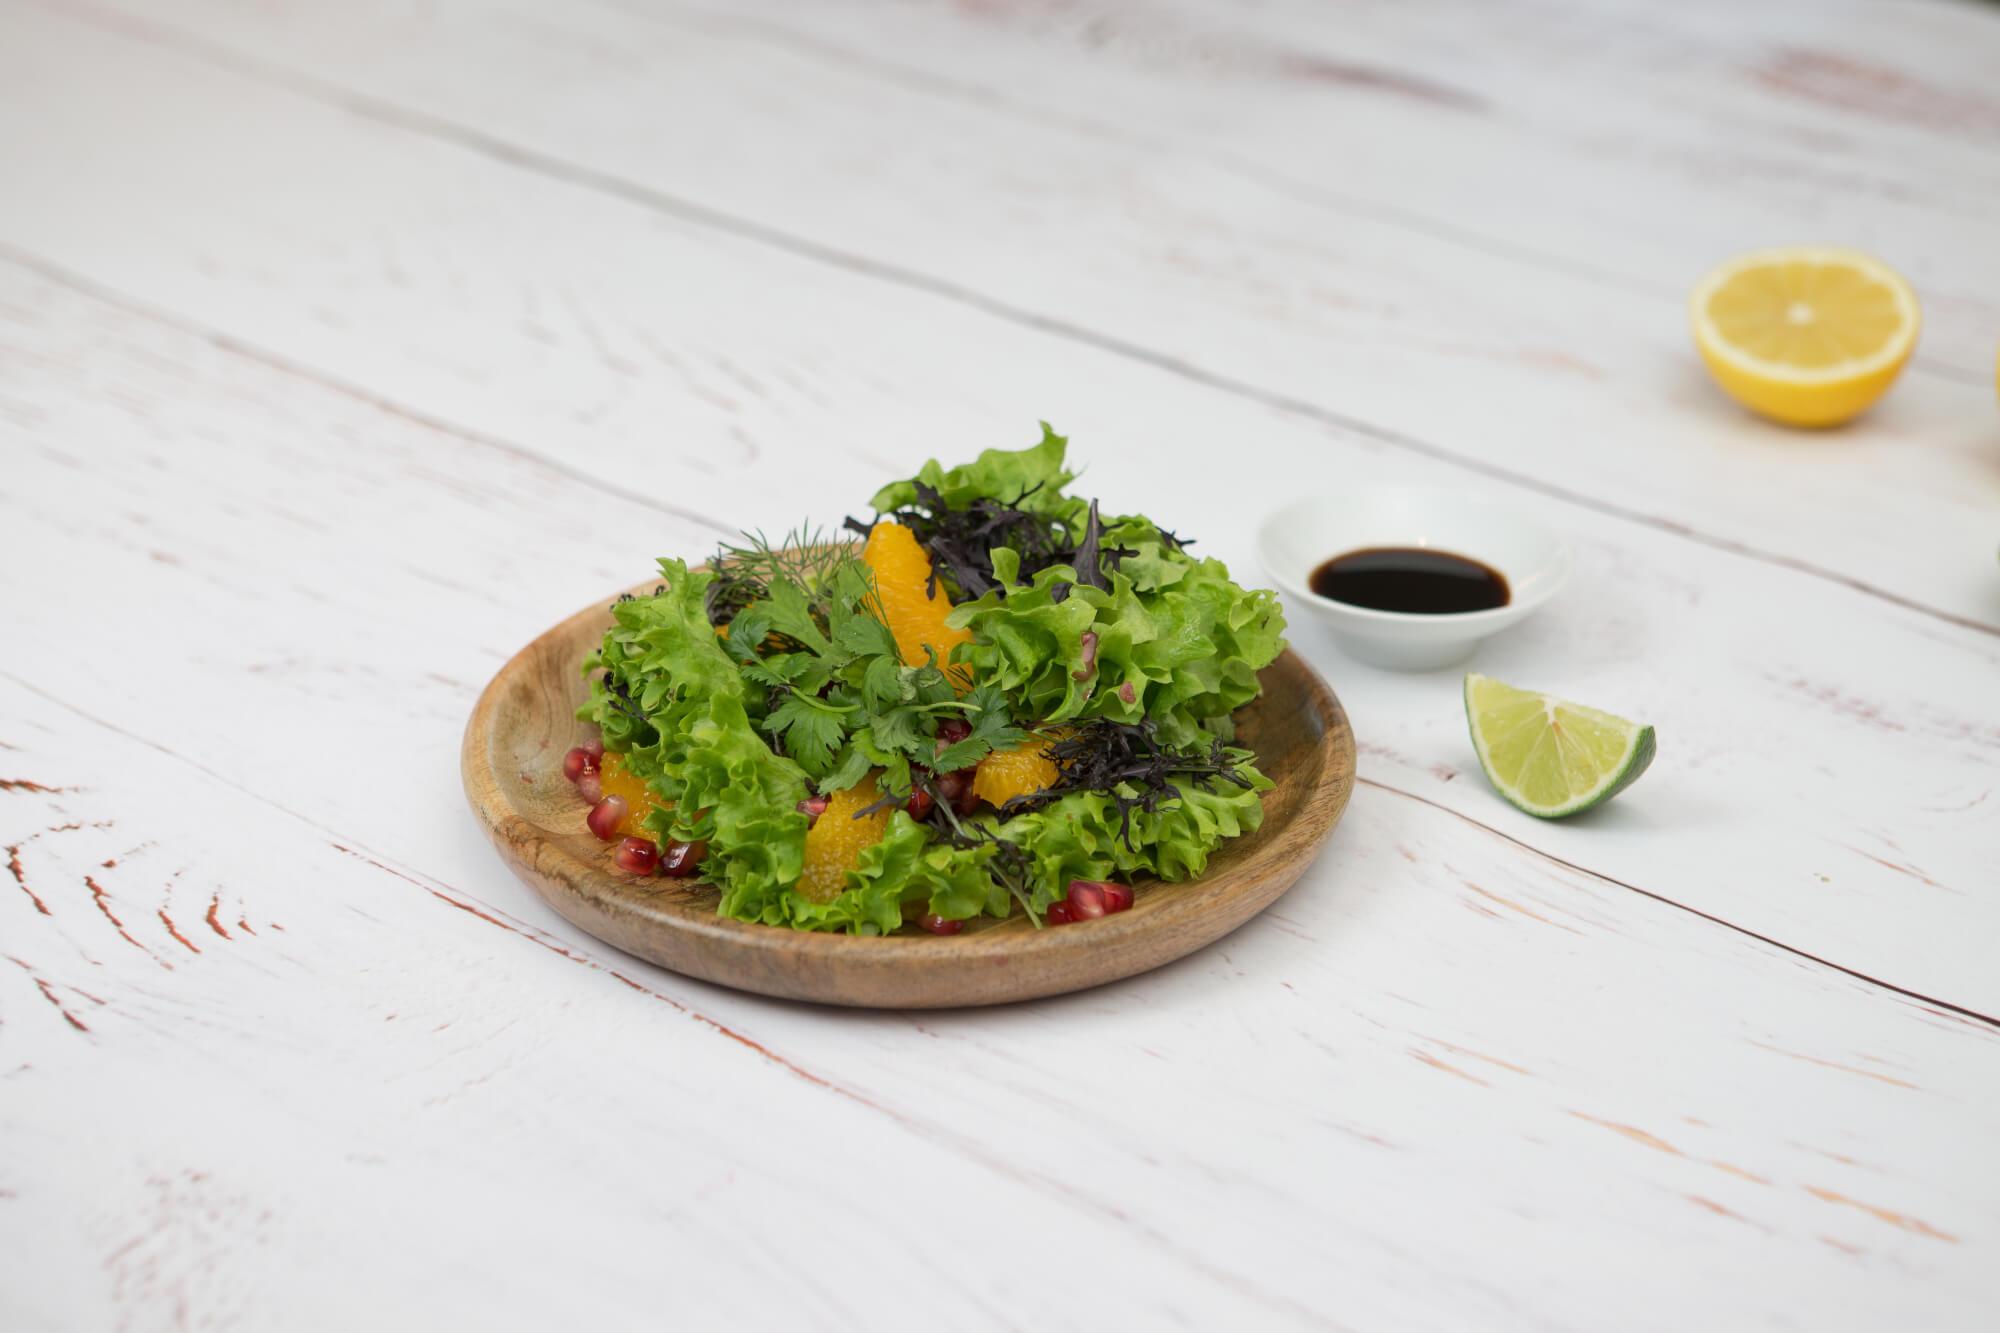 Sitrussalat